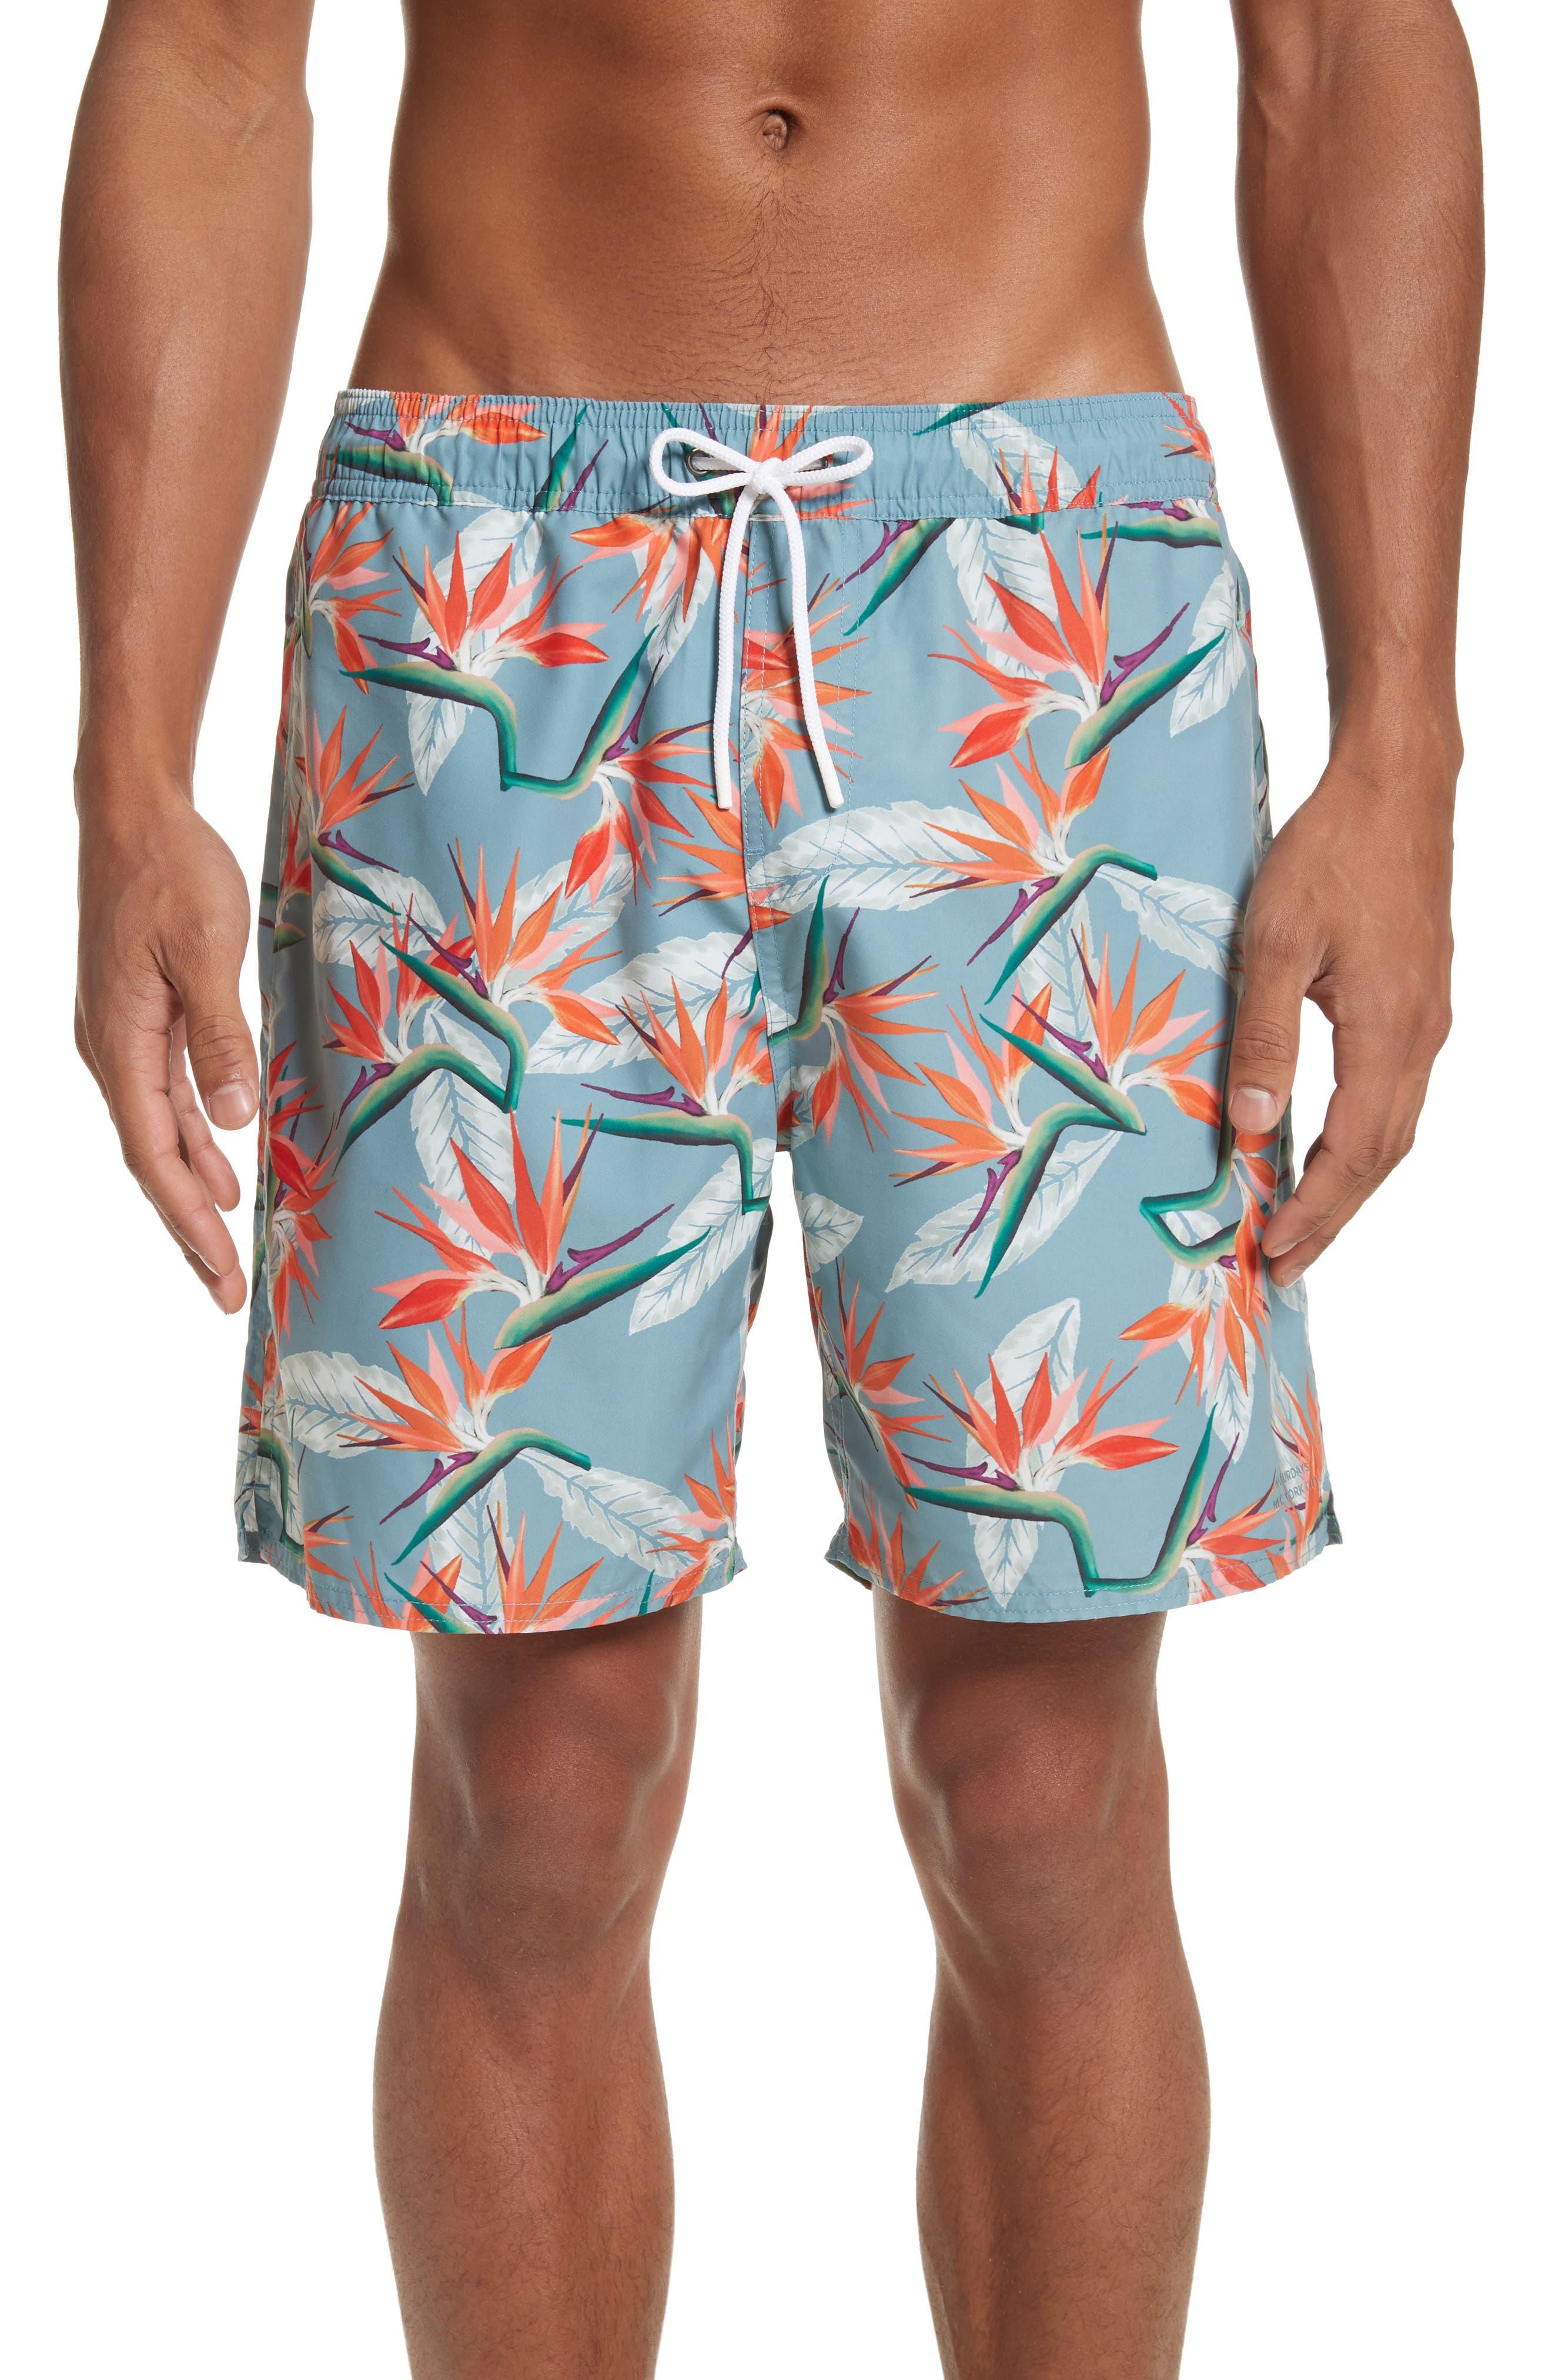 Timothy Paradise Swim Shorts,                         Main,                         color, PARADISE PRINT